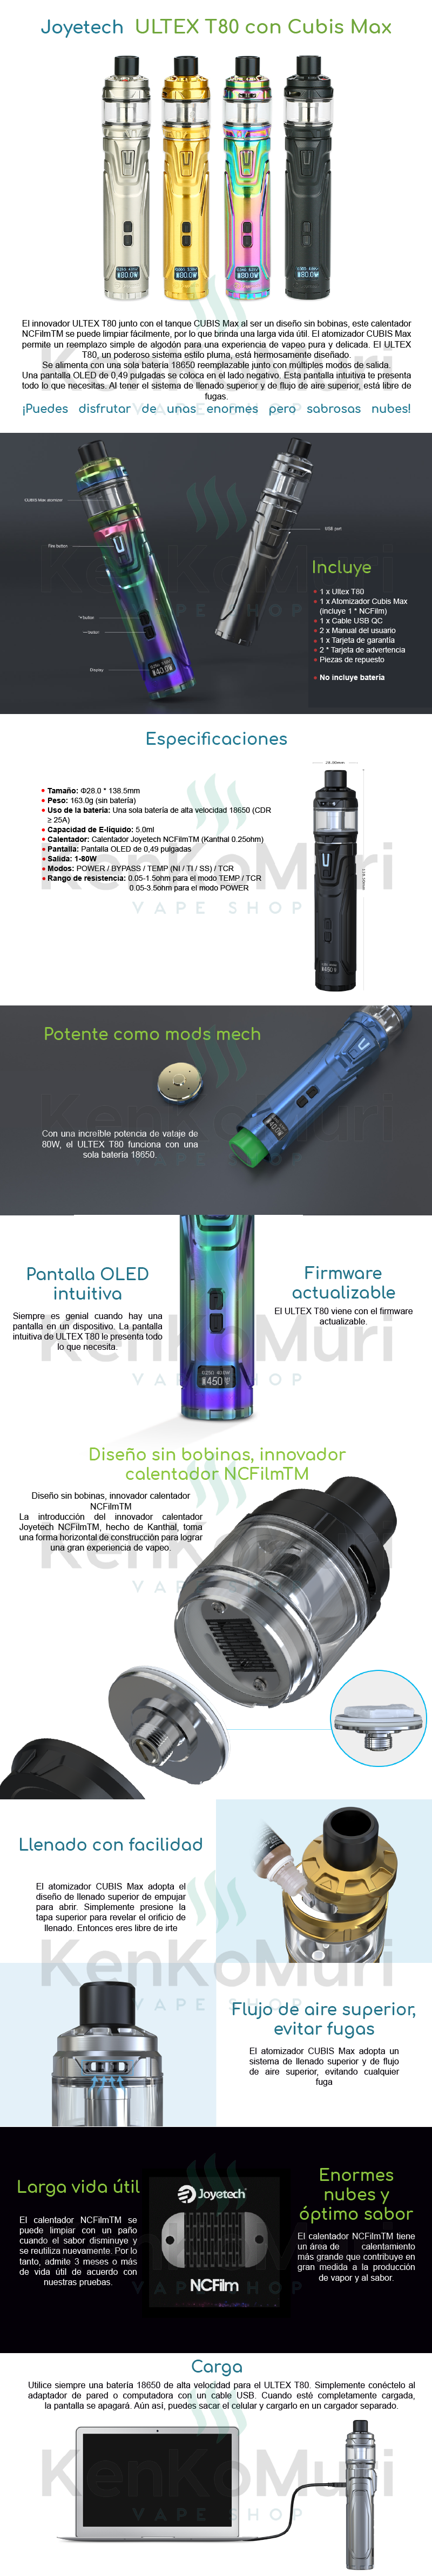 cigarroelectronico-vapeador-ultext80-cubismax-mexico-kenkomuri